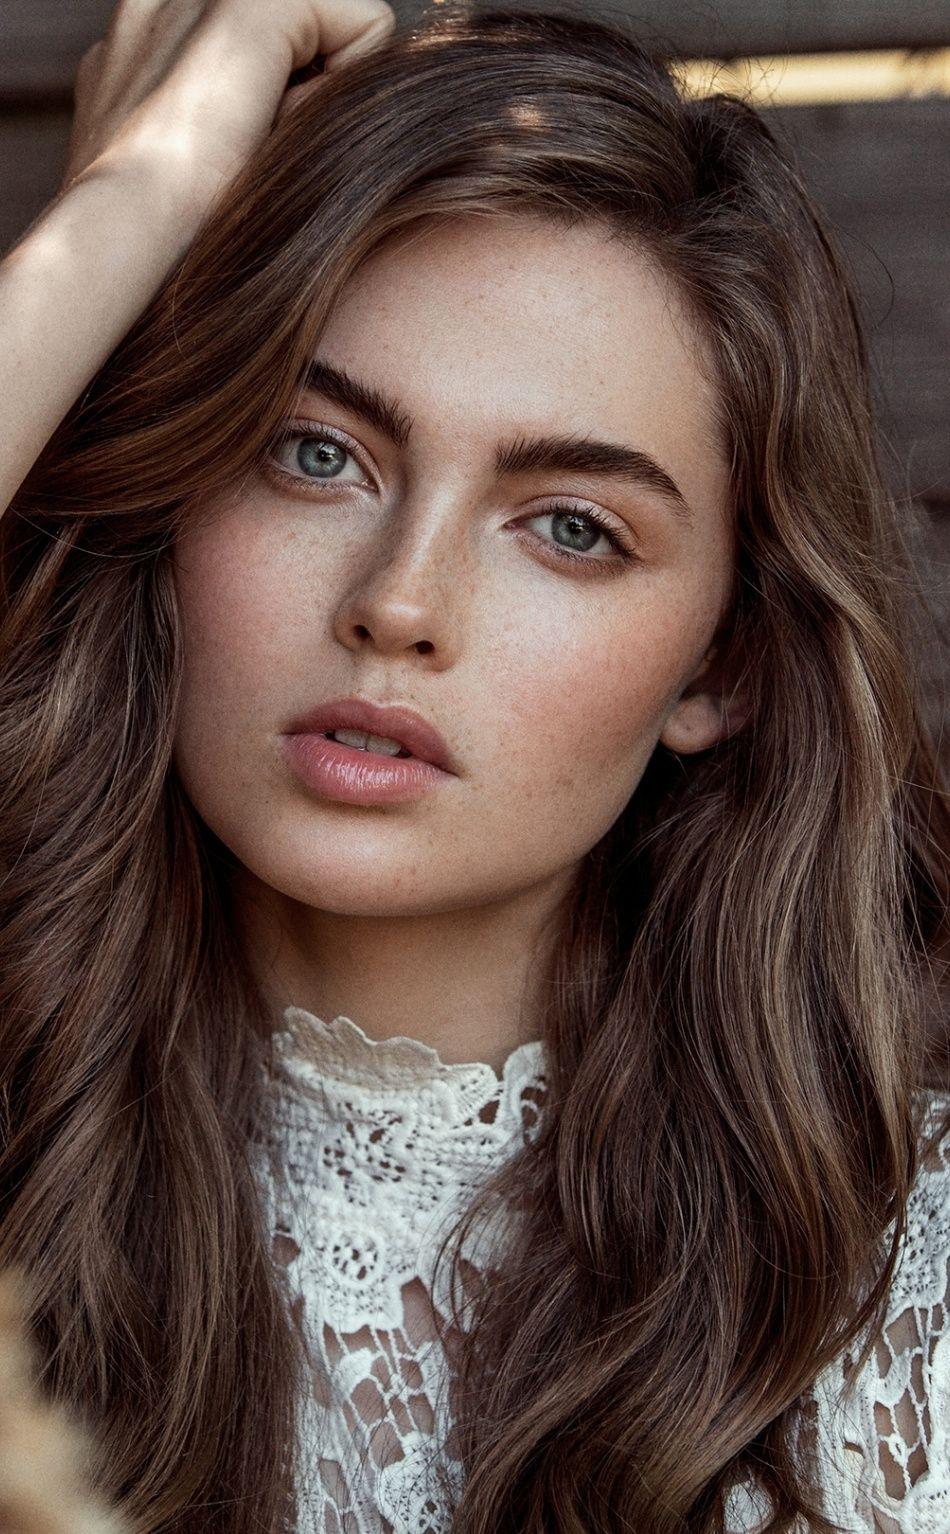 950x1534 Aqua Eyes Brunette Gorgeous Woman Wallpaper Brunette Green Eyes Brunette Blue Eyes Gorgeous Women